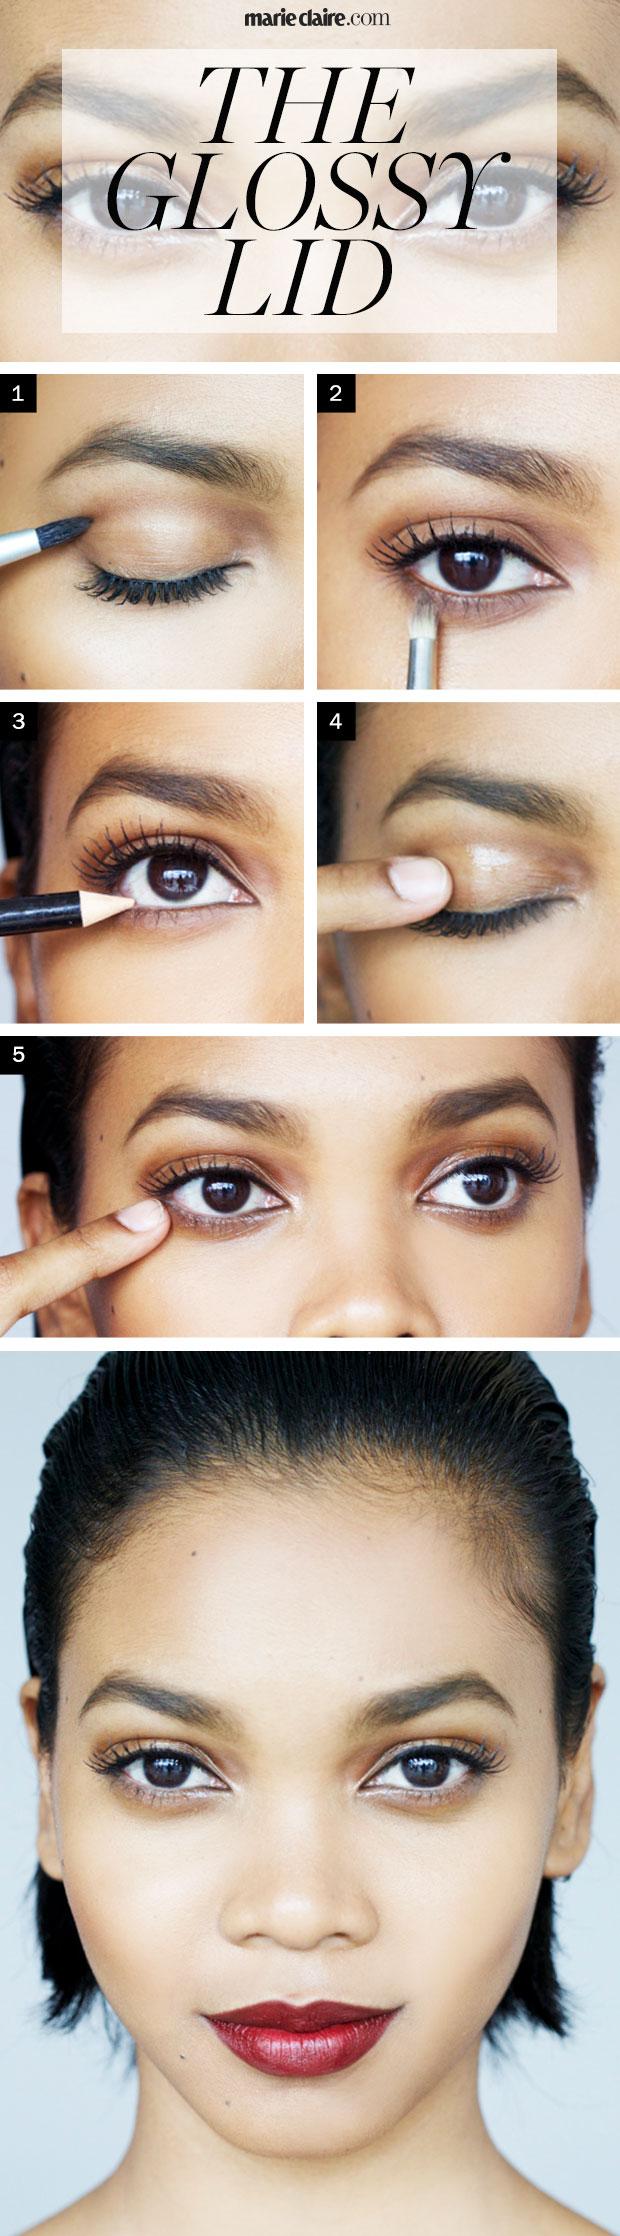 54835b894bd53_-_mc_makeuptutorial_the-glossy-lid.jpg